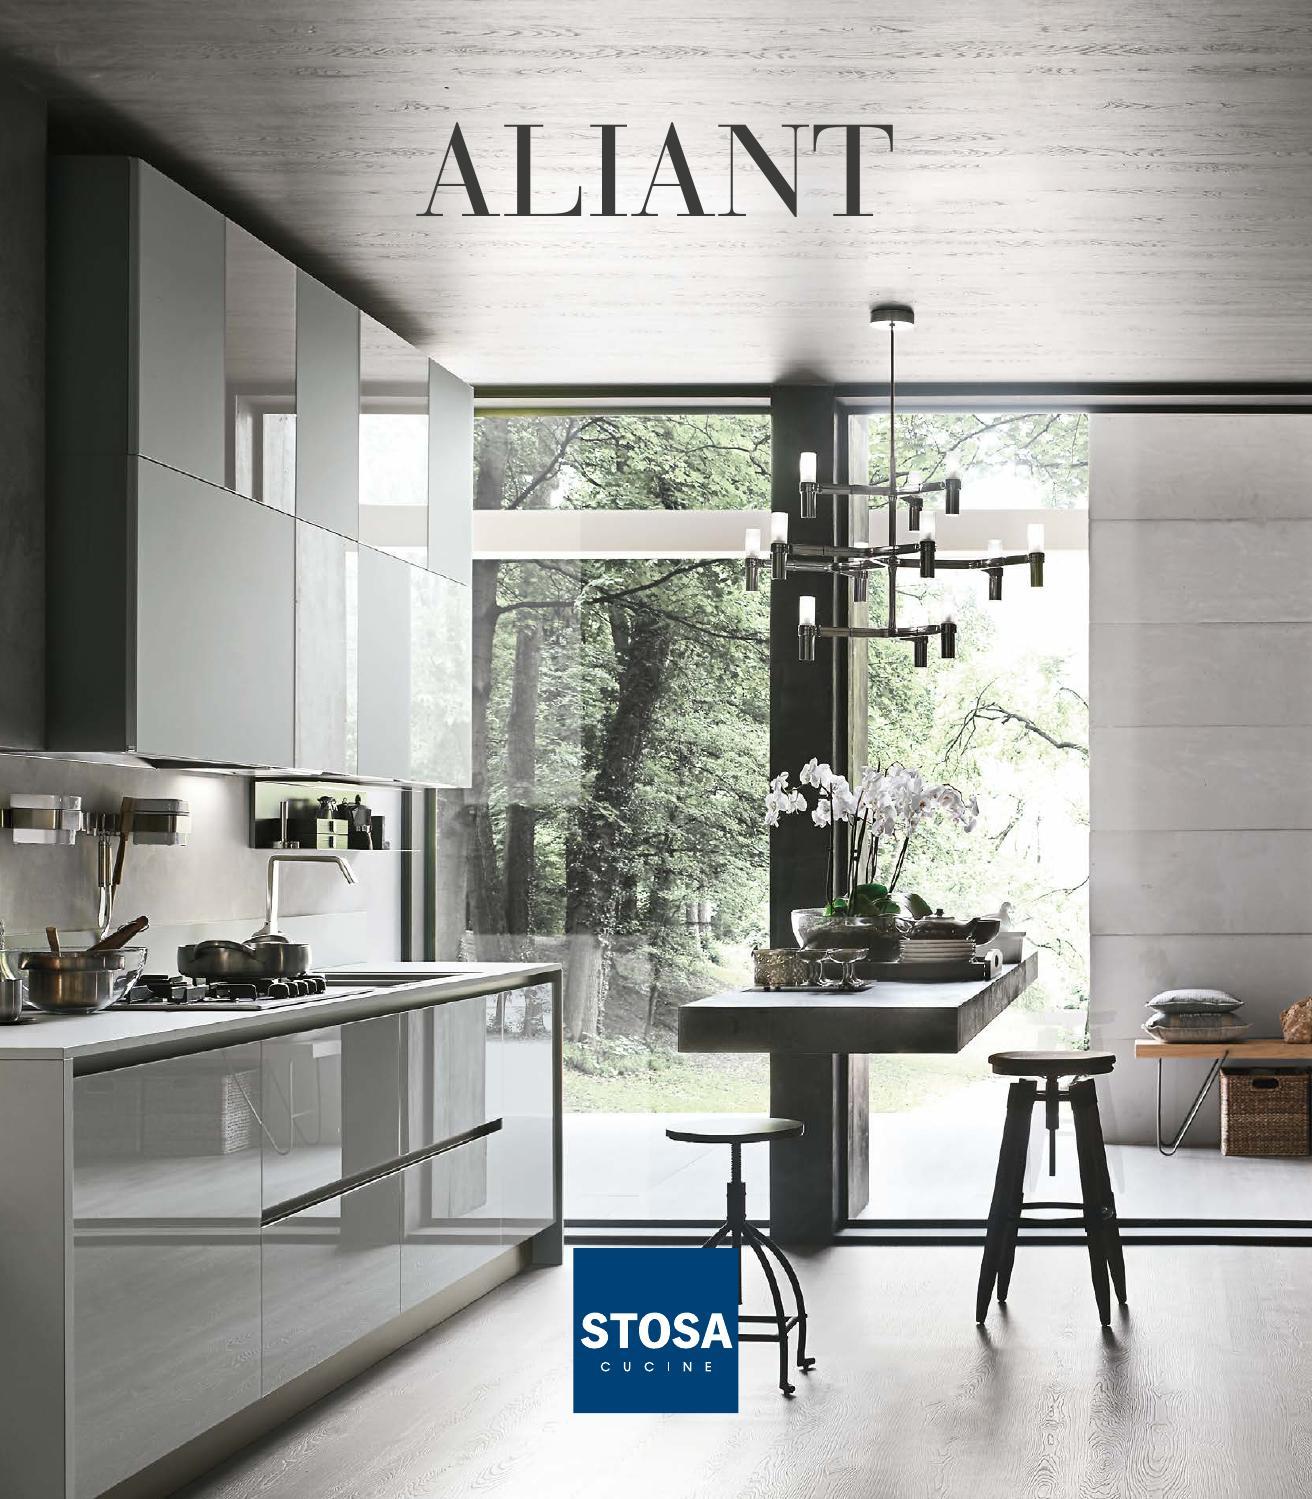 Catalogo cucine moderne stosa aliant by stosa cucine issuu - Catalogo stosa cucine ...